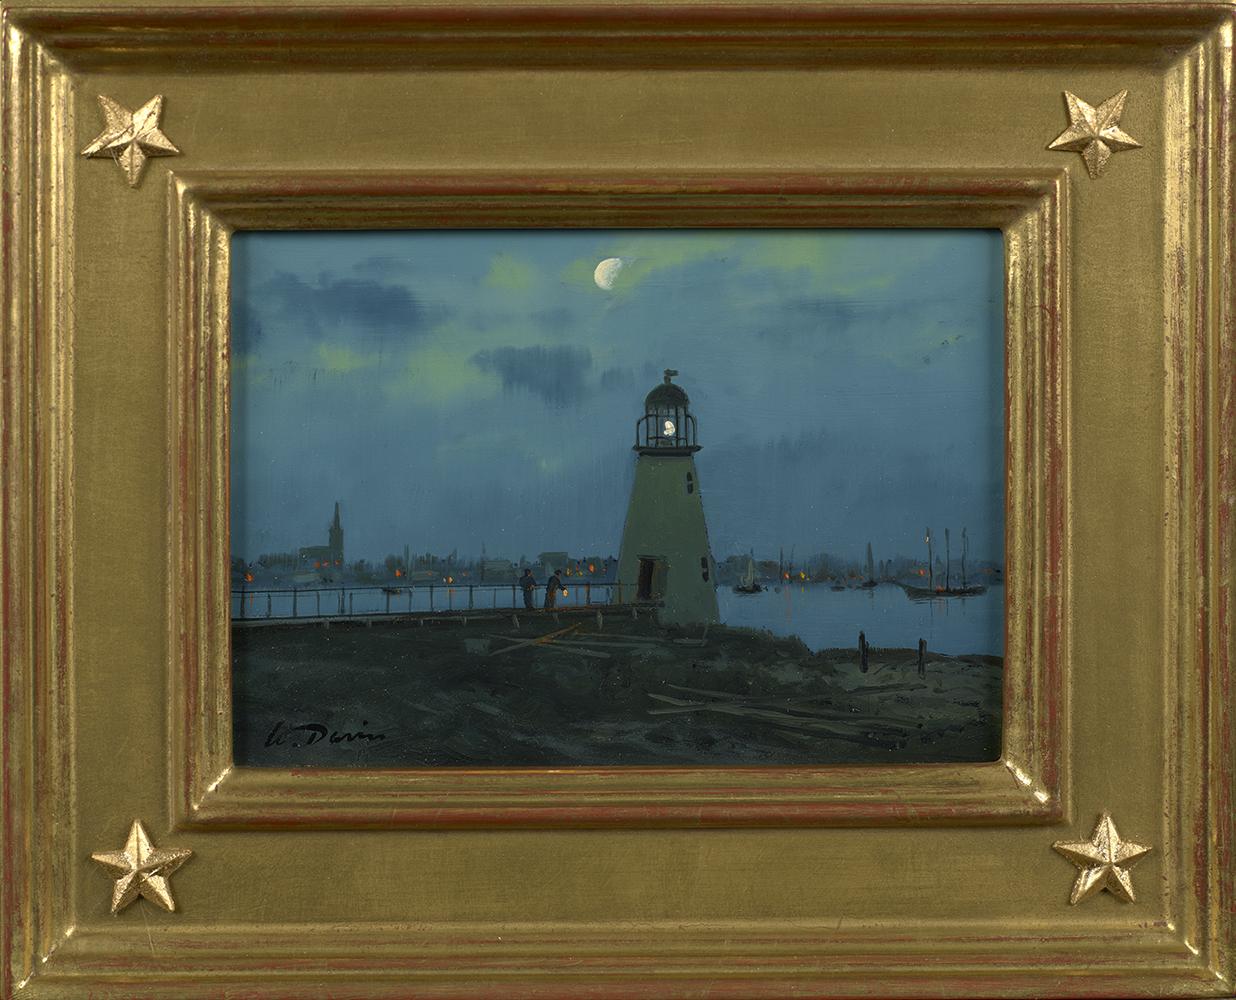 william_davis_wd1007_palmer_island_light_new_bedford_framed.jpg